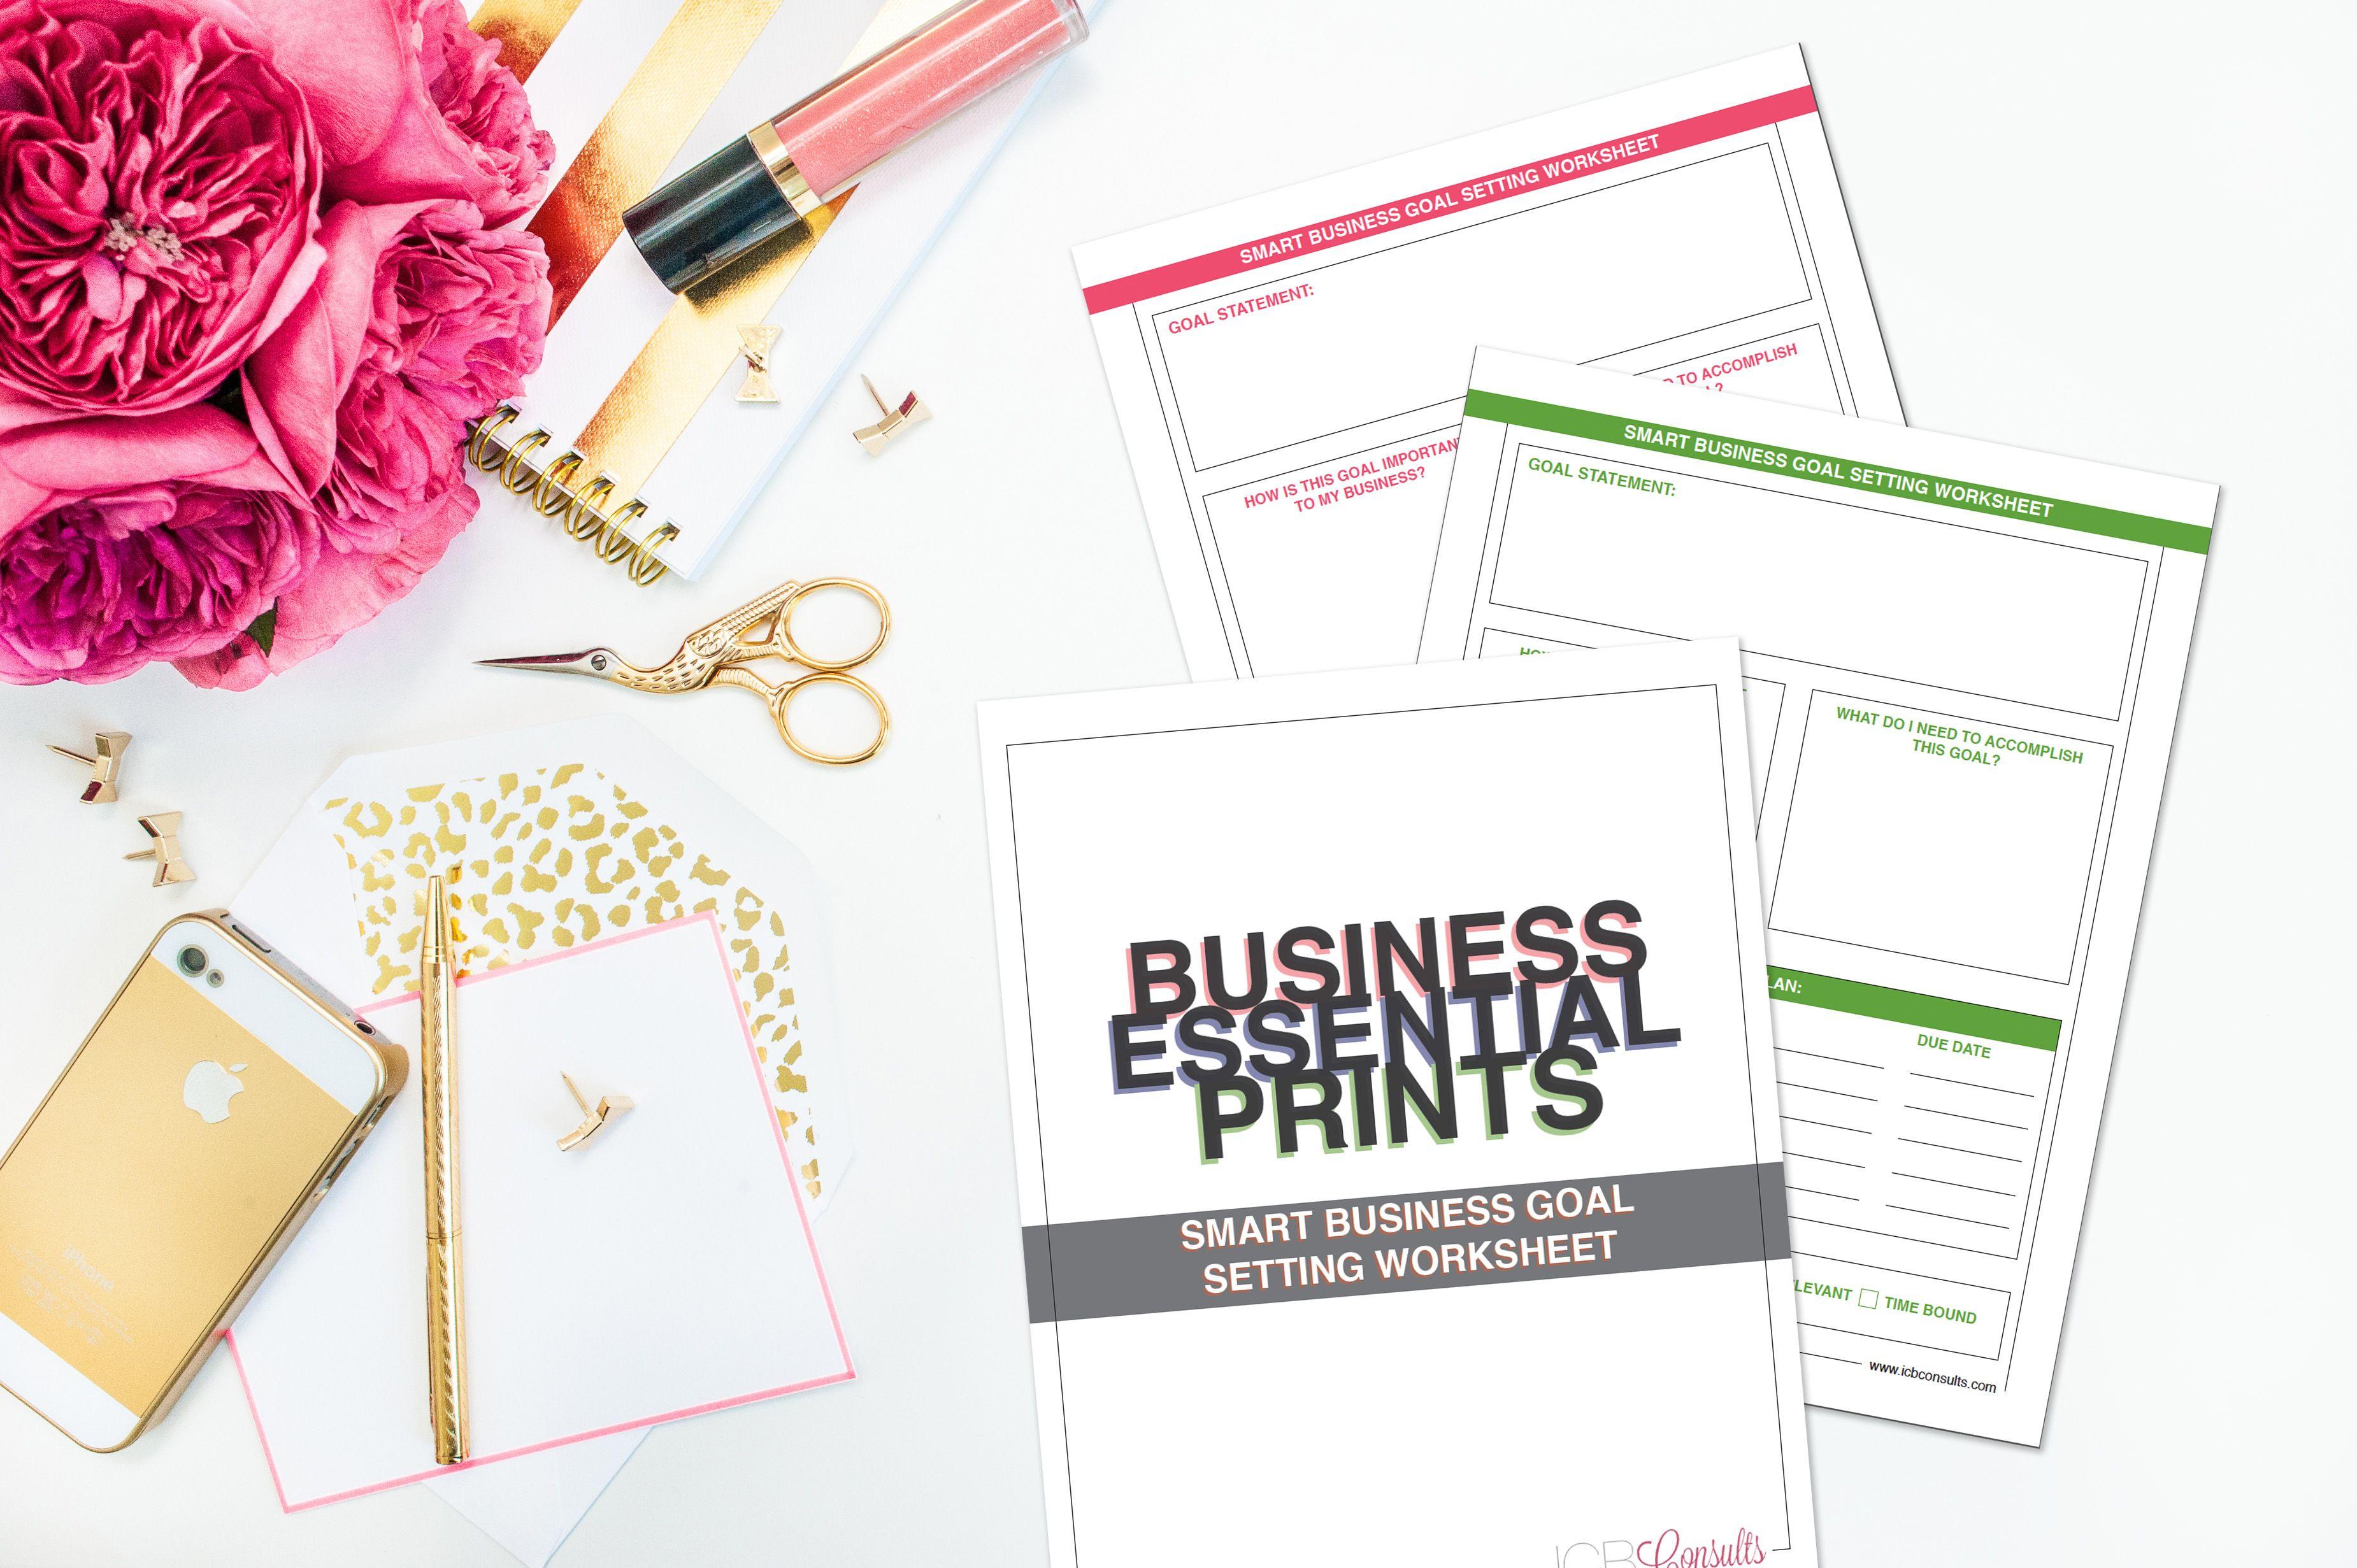 Smart Goals Worksheet  Business Worksheets Guides Kits And More